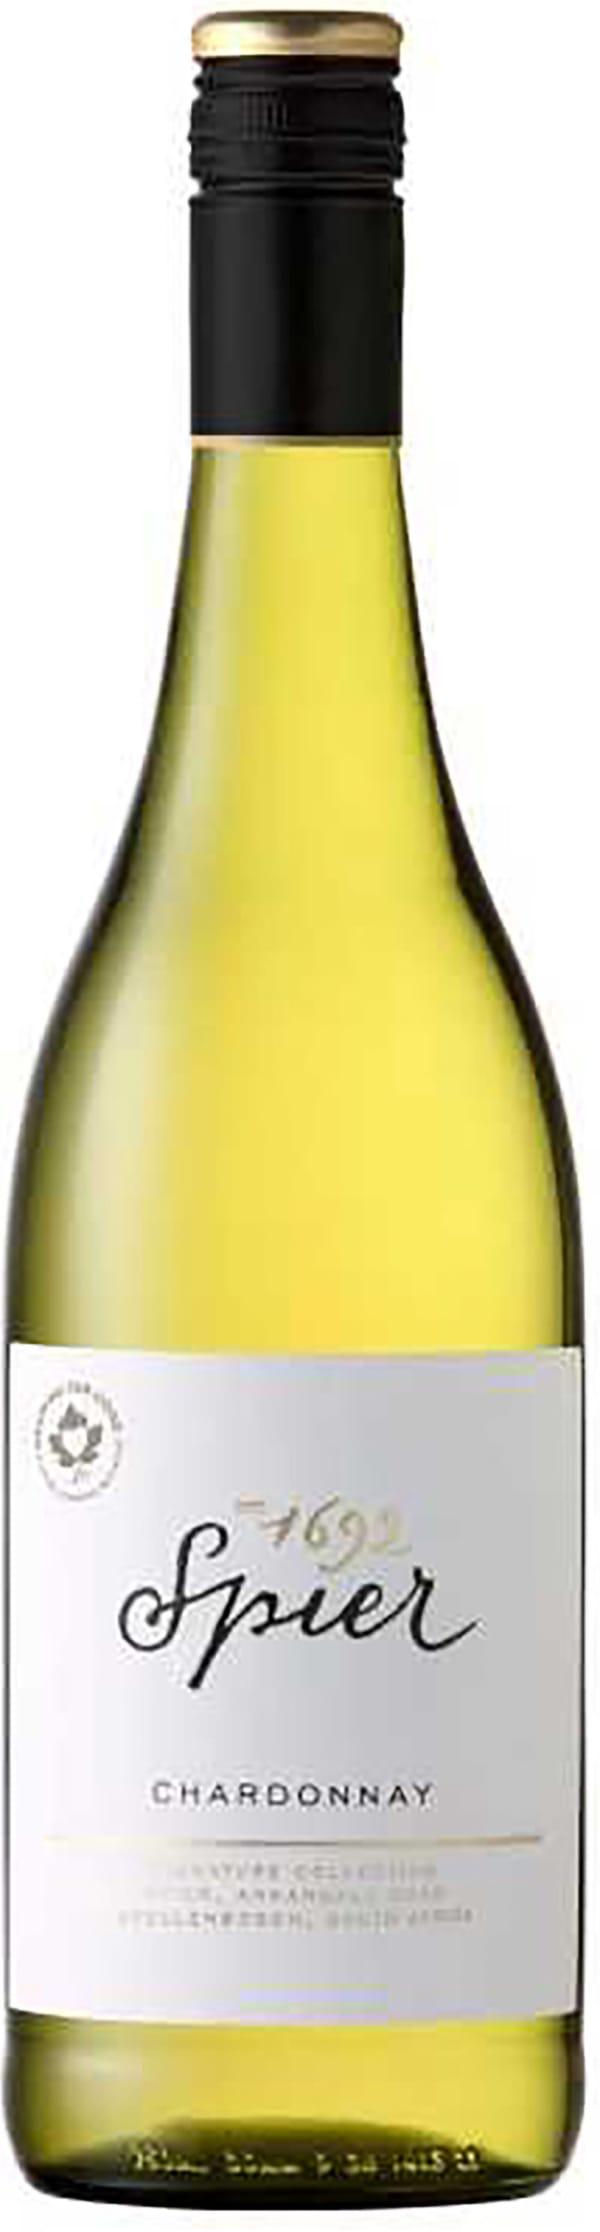 Spier Signature Chardonnay 2016